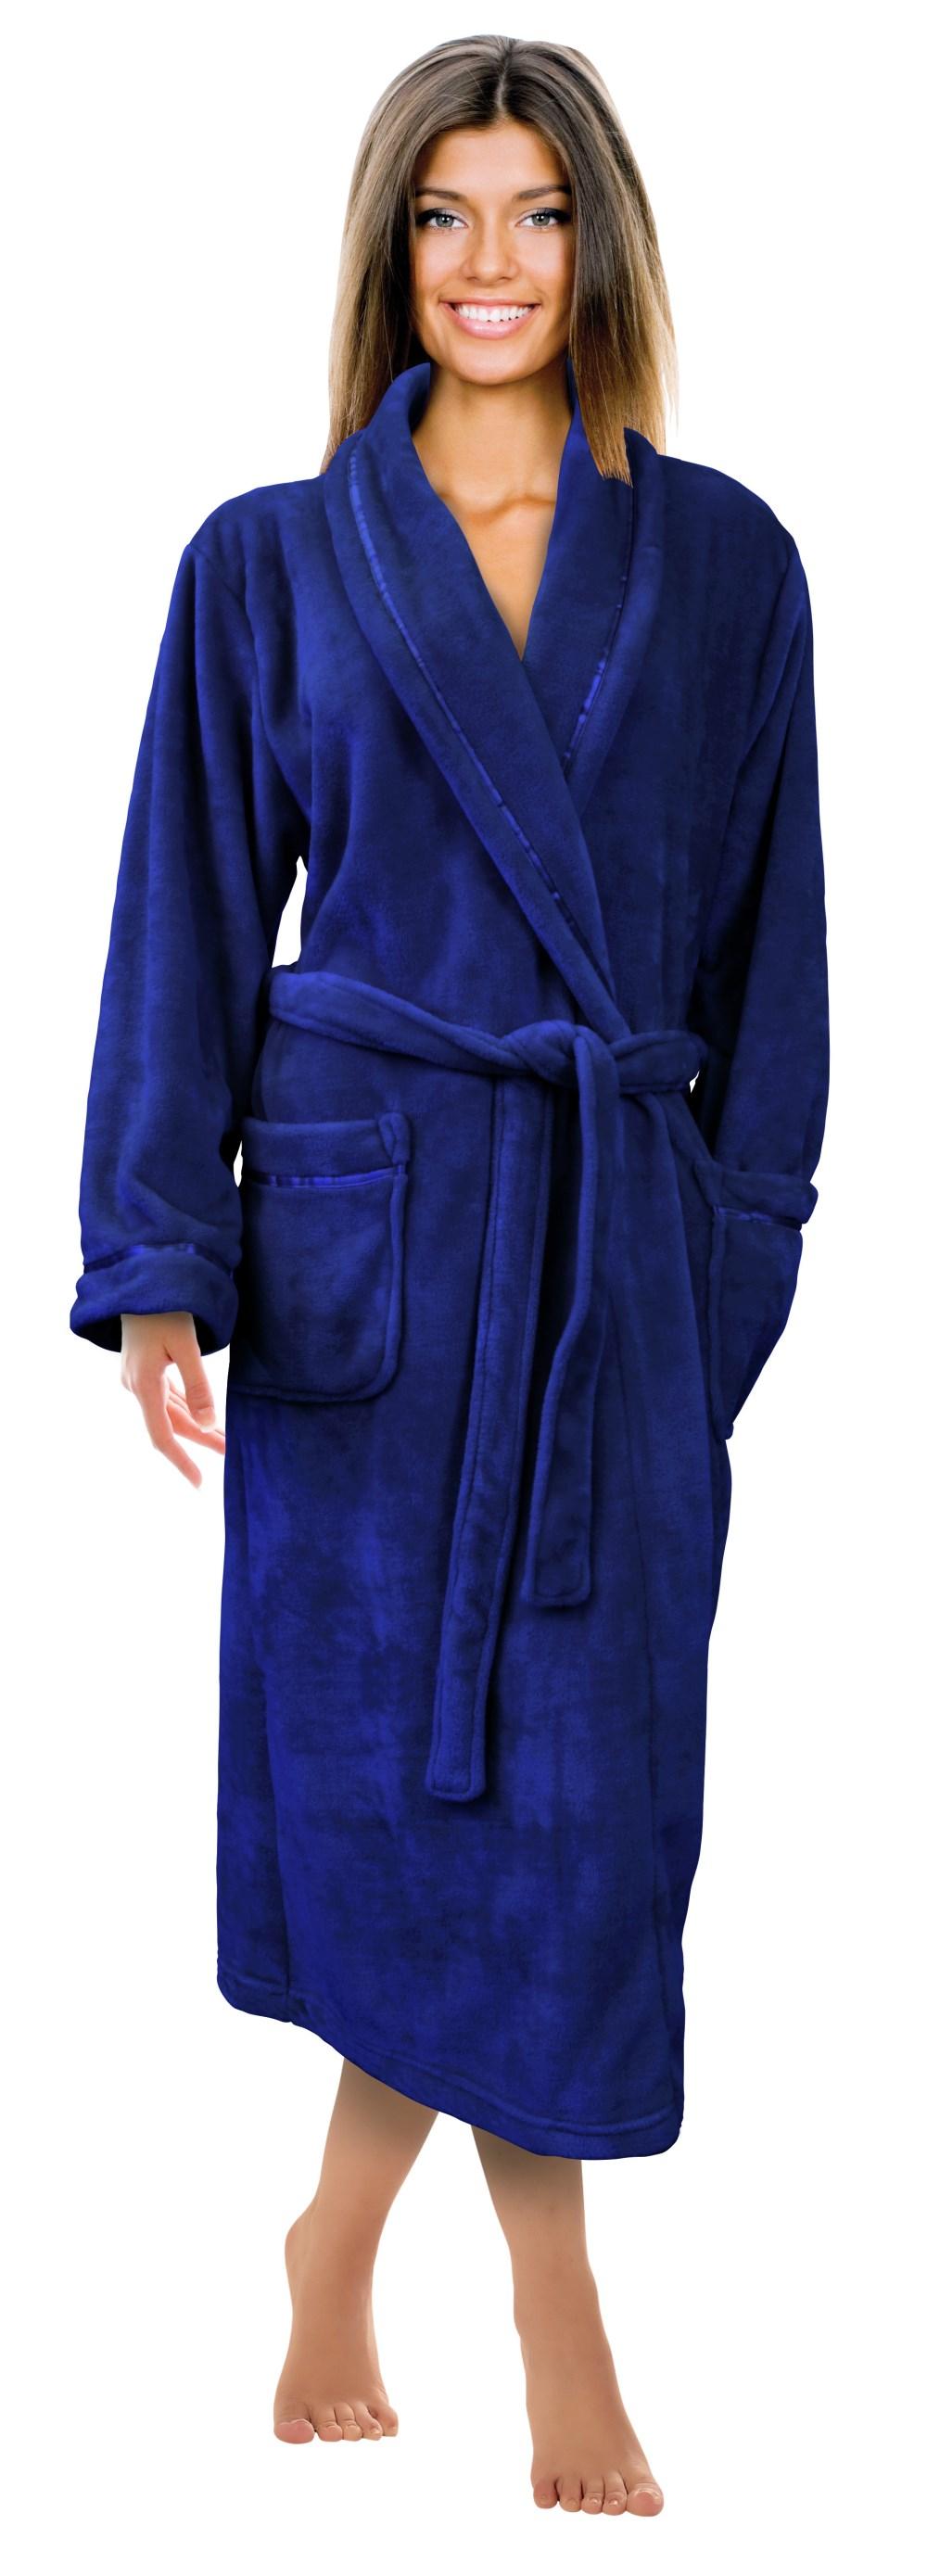 Napa® Womens Super Soft Warm Microfiber Fleece Plush ...